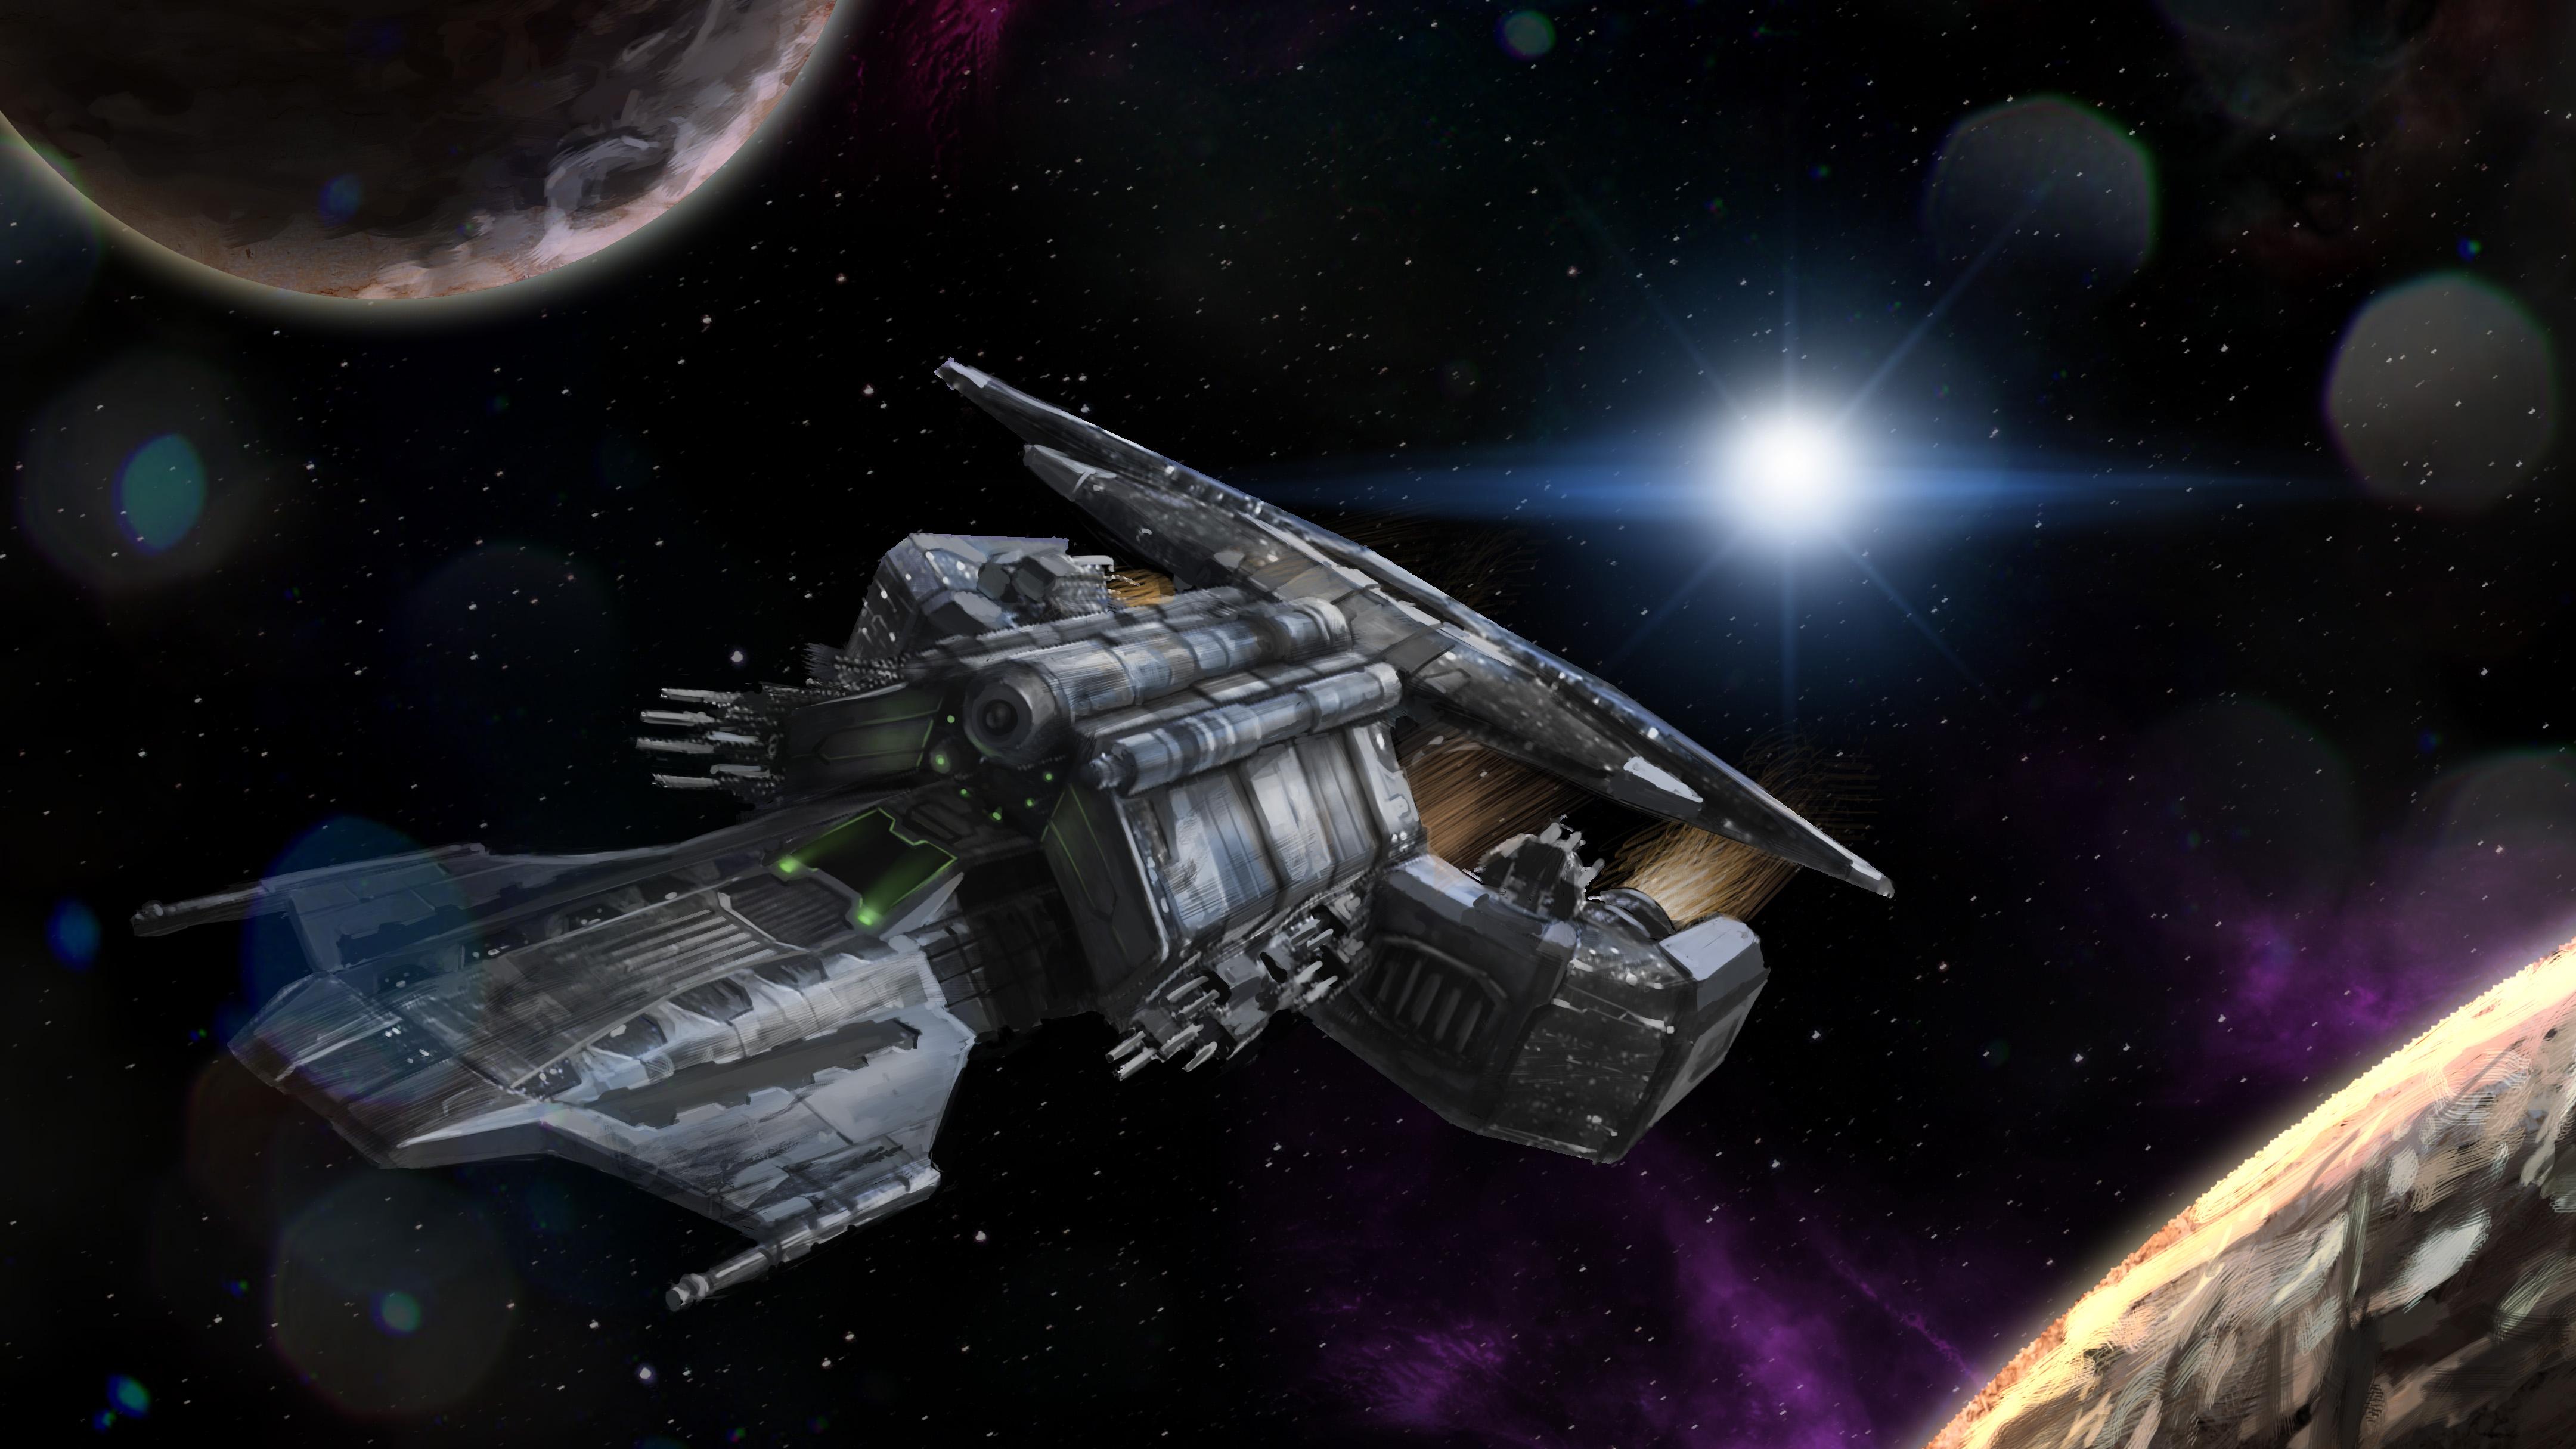 science fiction space sandbox - HD2488×1400